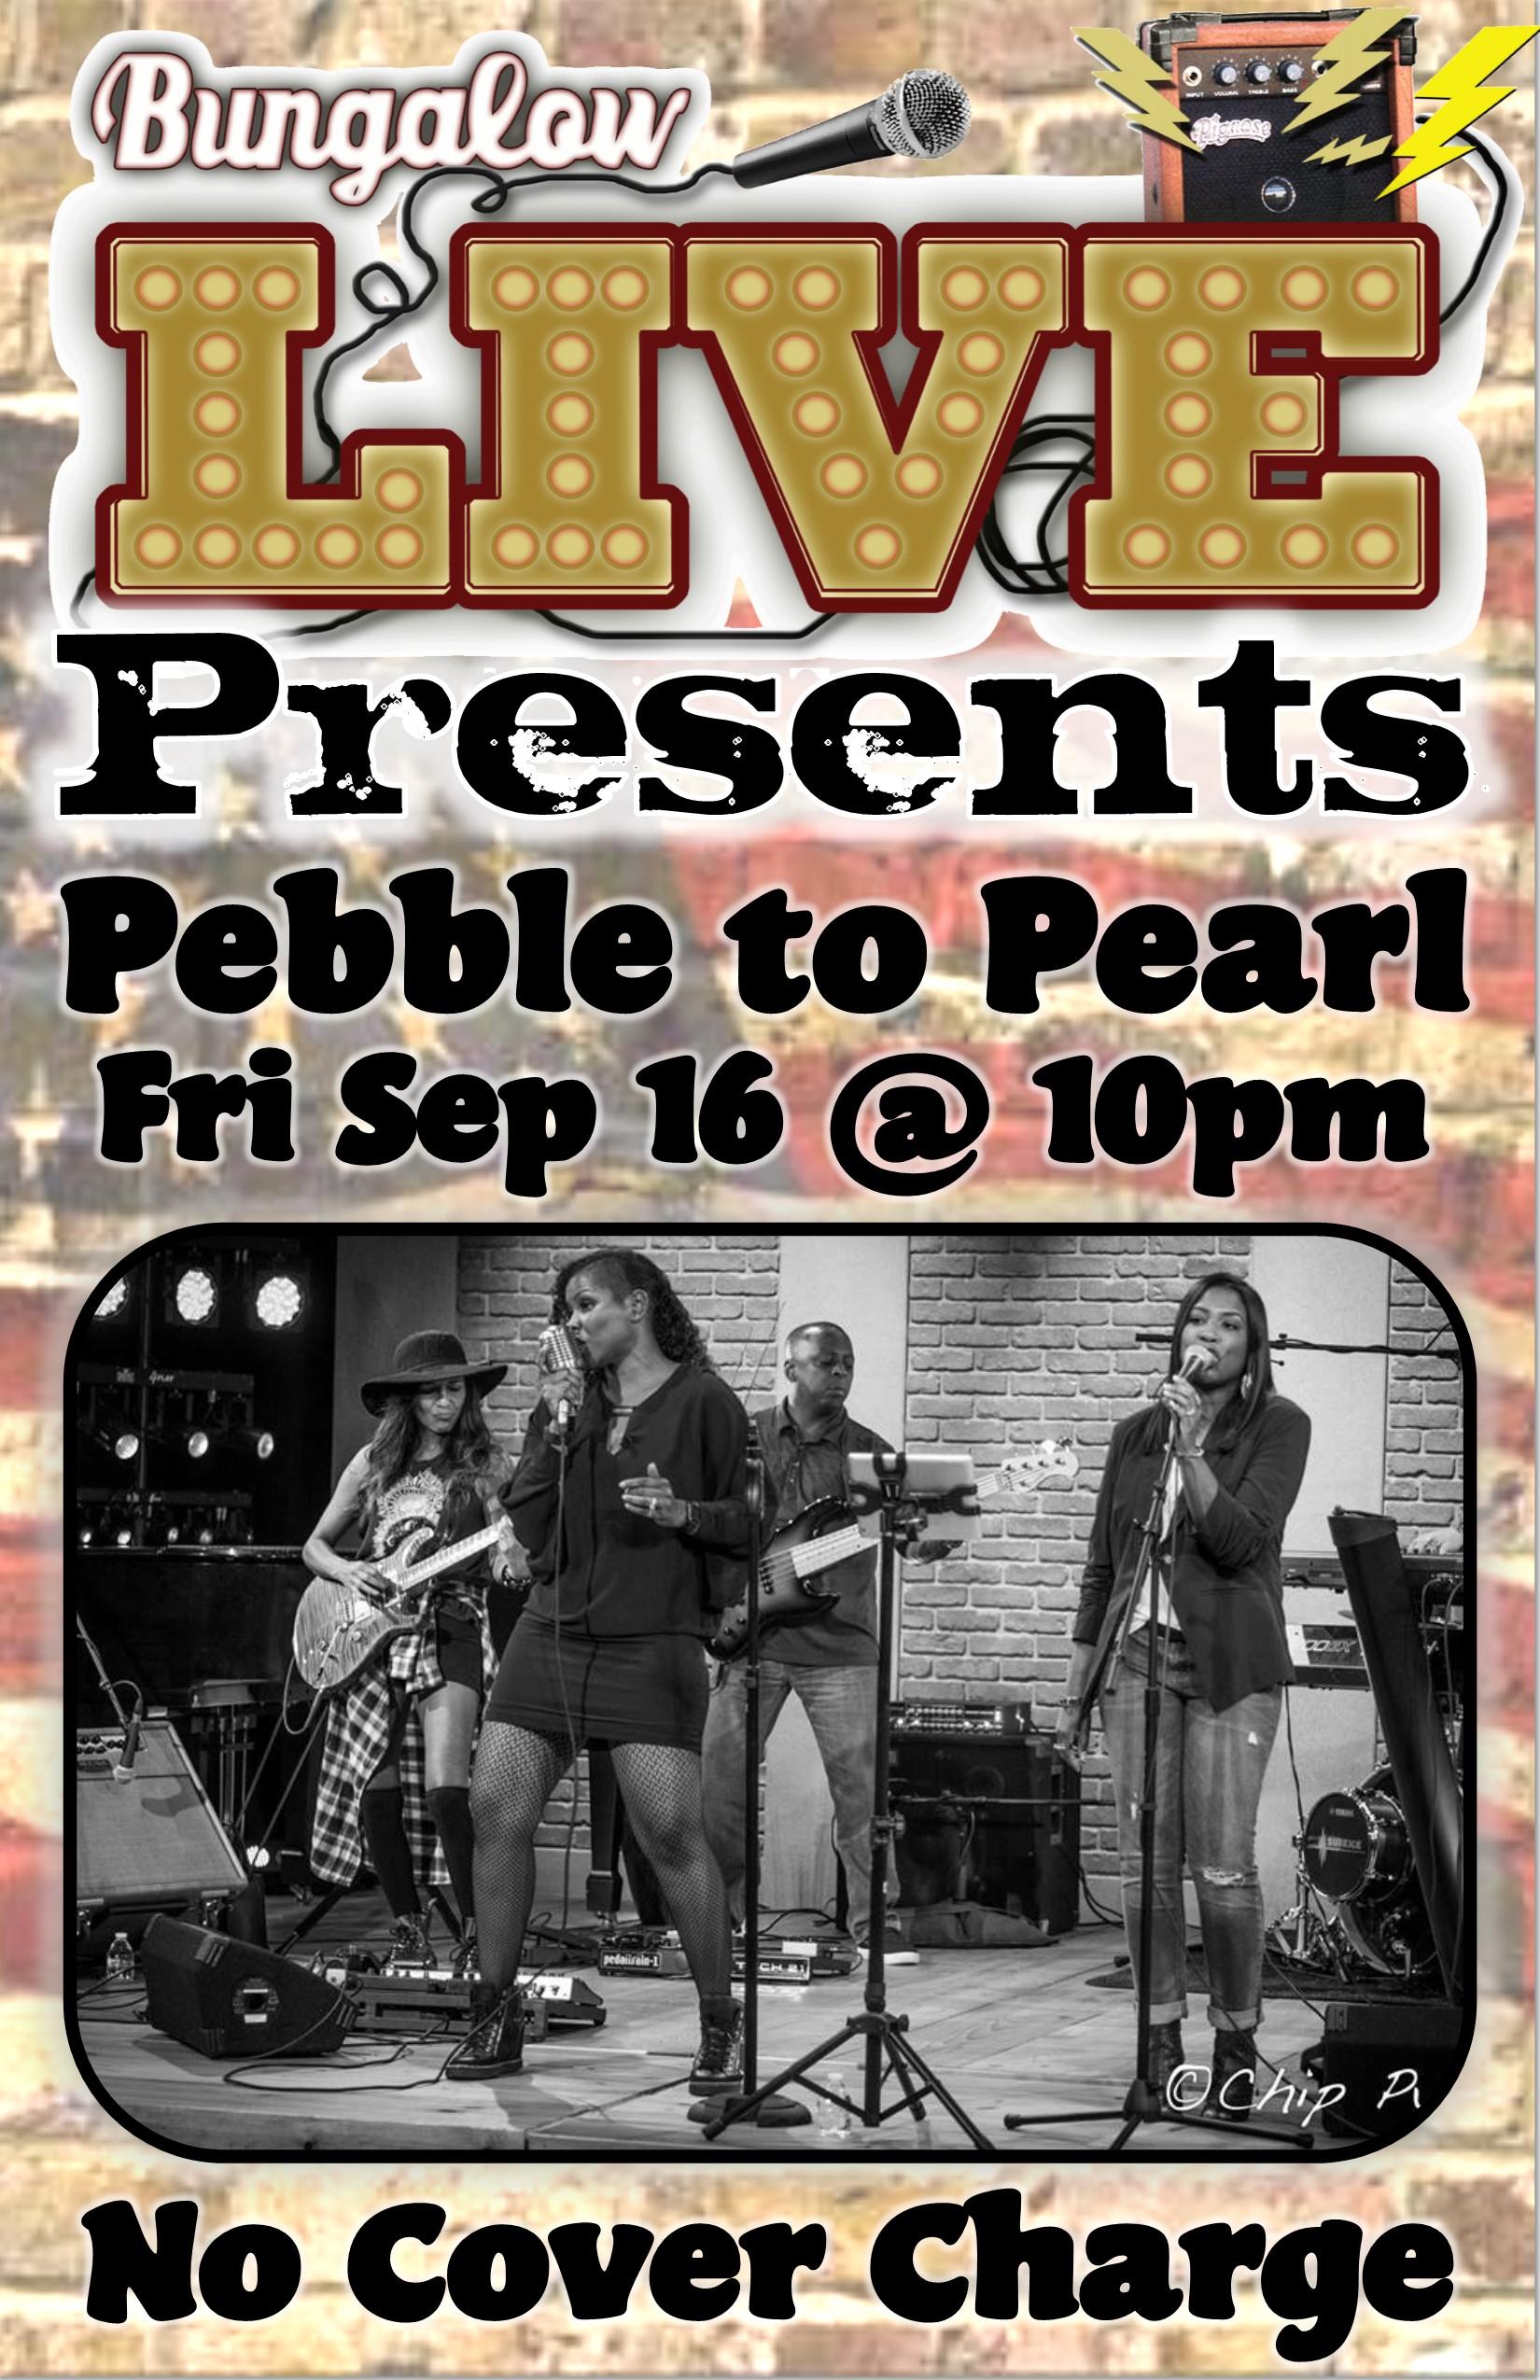 Pebble to Pearl band 11X17